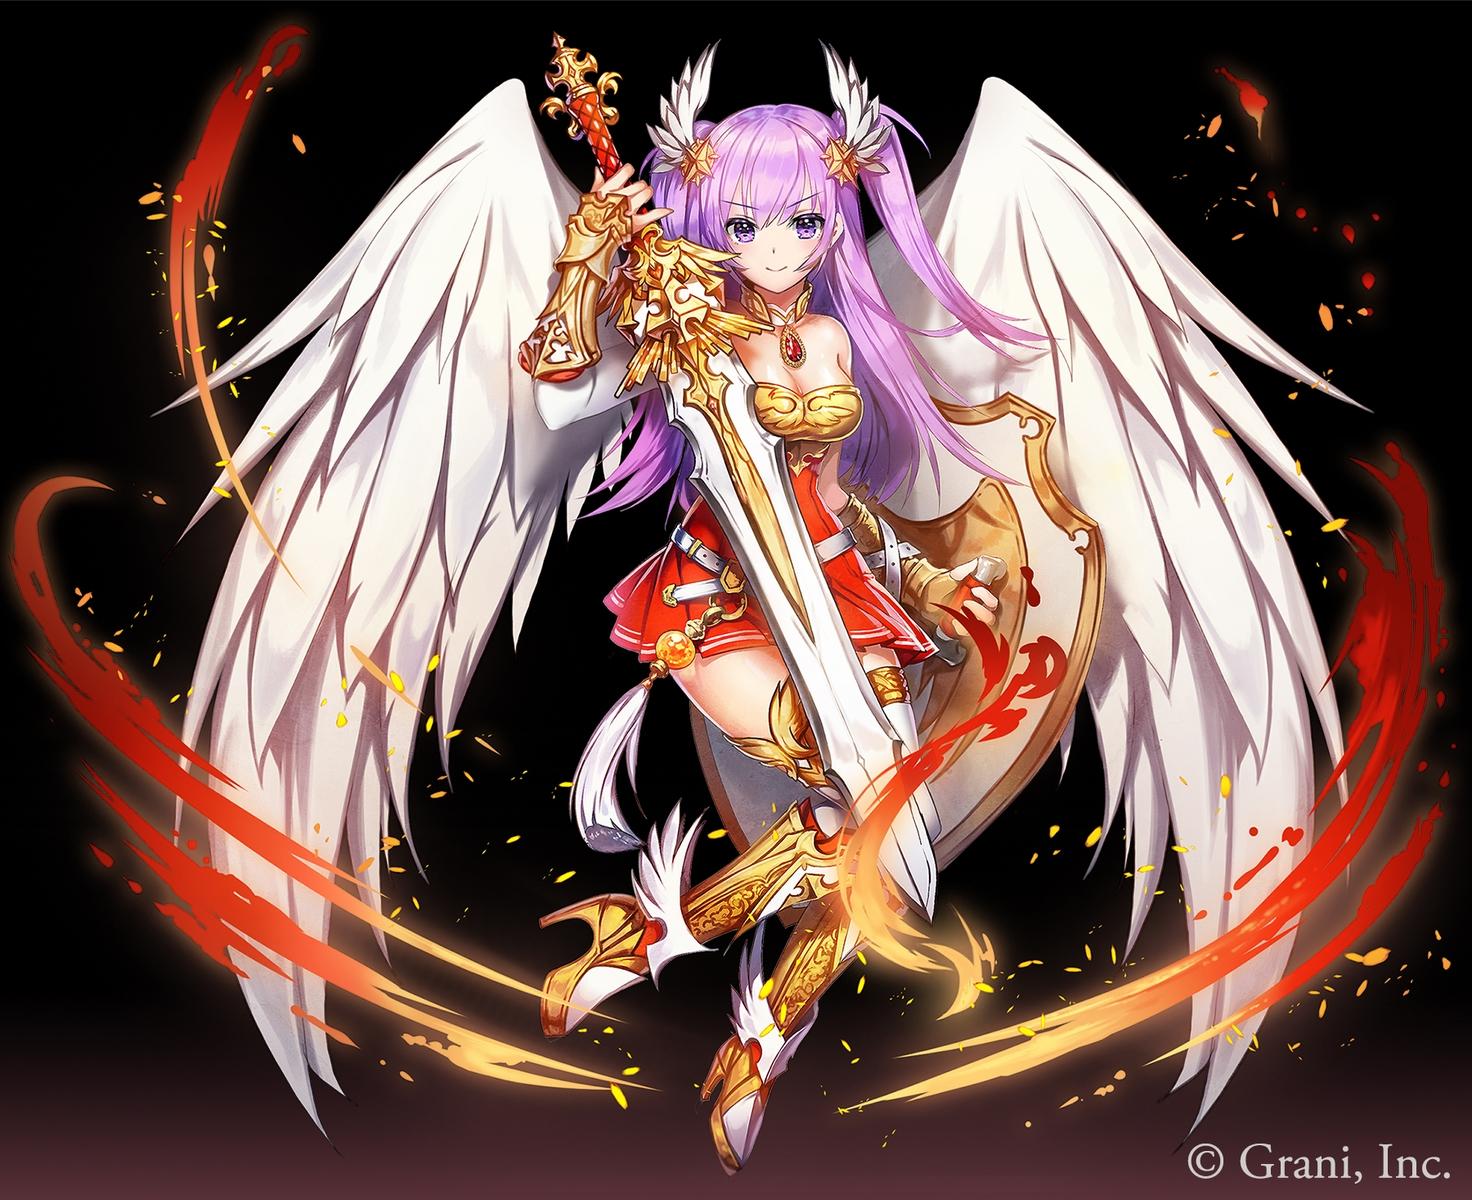 applecaramel_(acaramel) armor black boots breasts cleavage dress fire gradient kurokishi_to_shiro_no_maou long_hair purple_eyes purple_hair sword thighhighs twintails weapon wings zettai_ryouiki